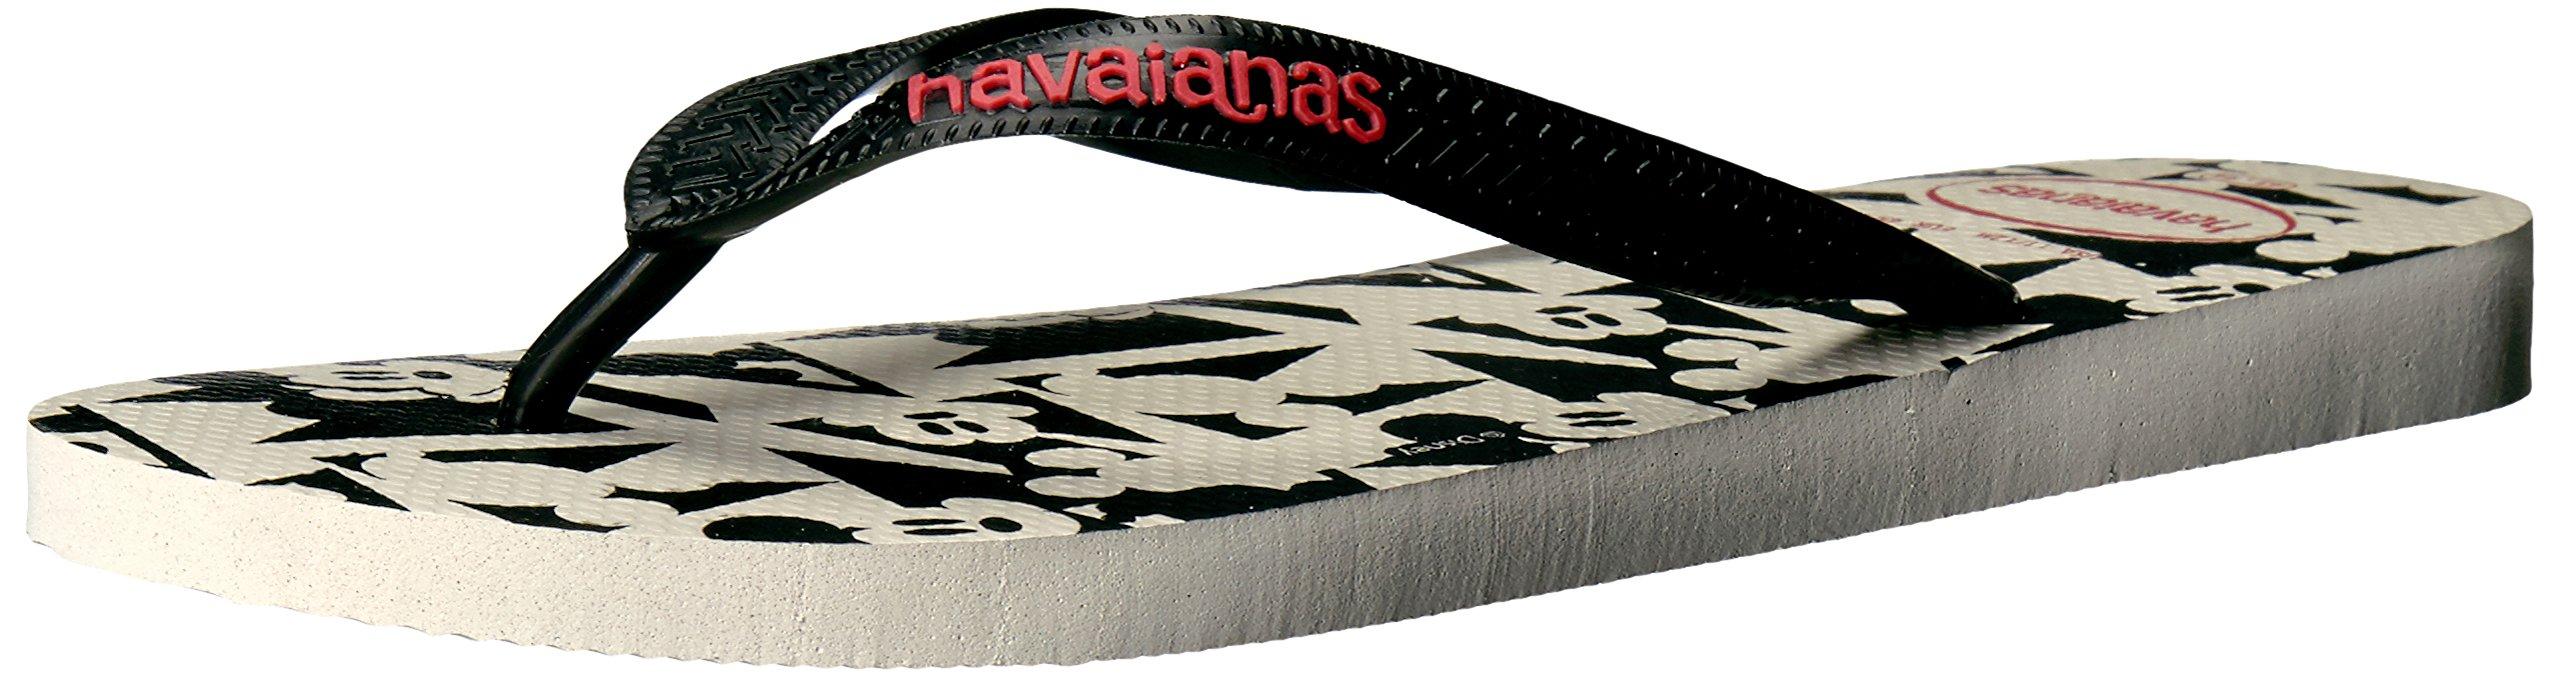 dc4704ea1 Galleon - Havaianas Men s Flip Flop Sandals